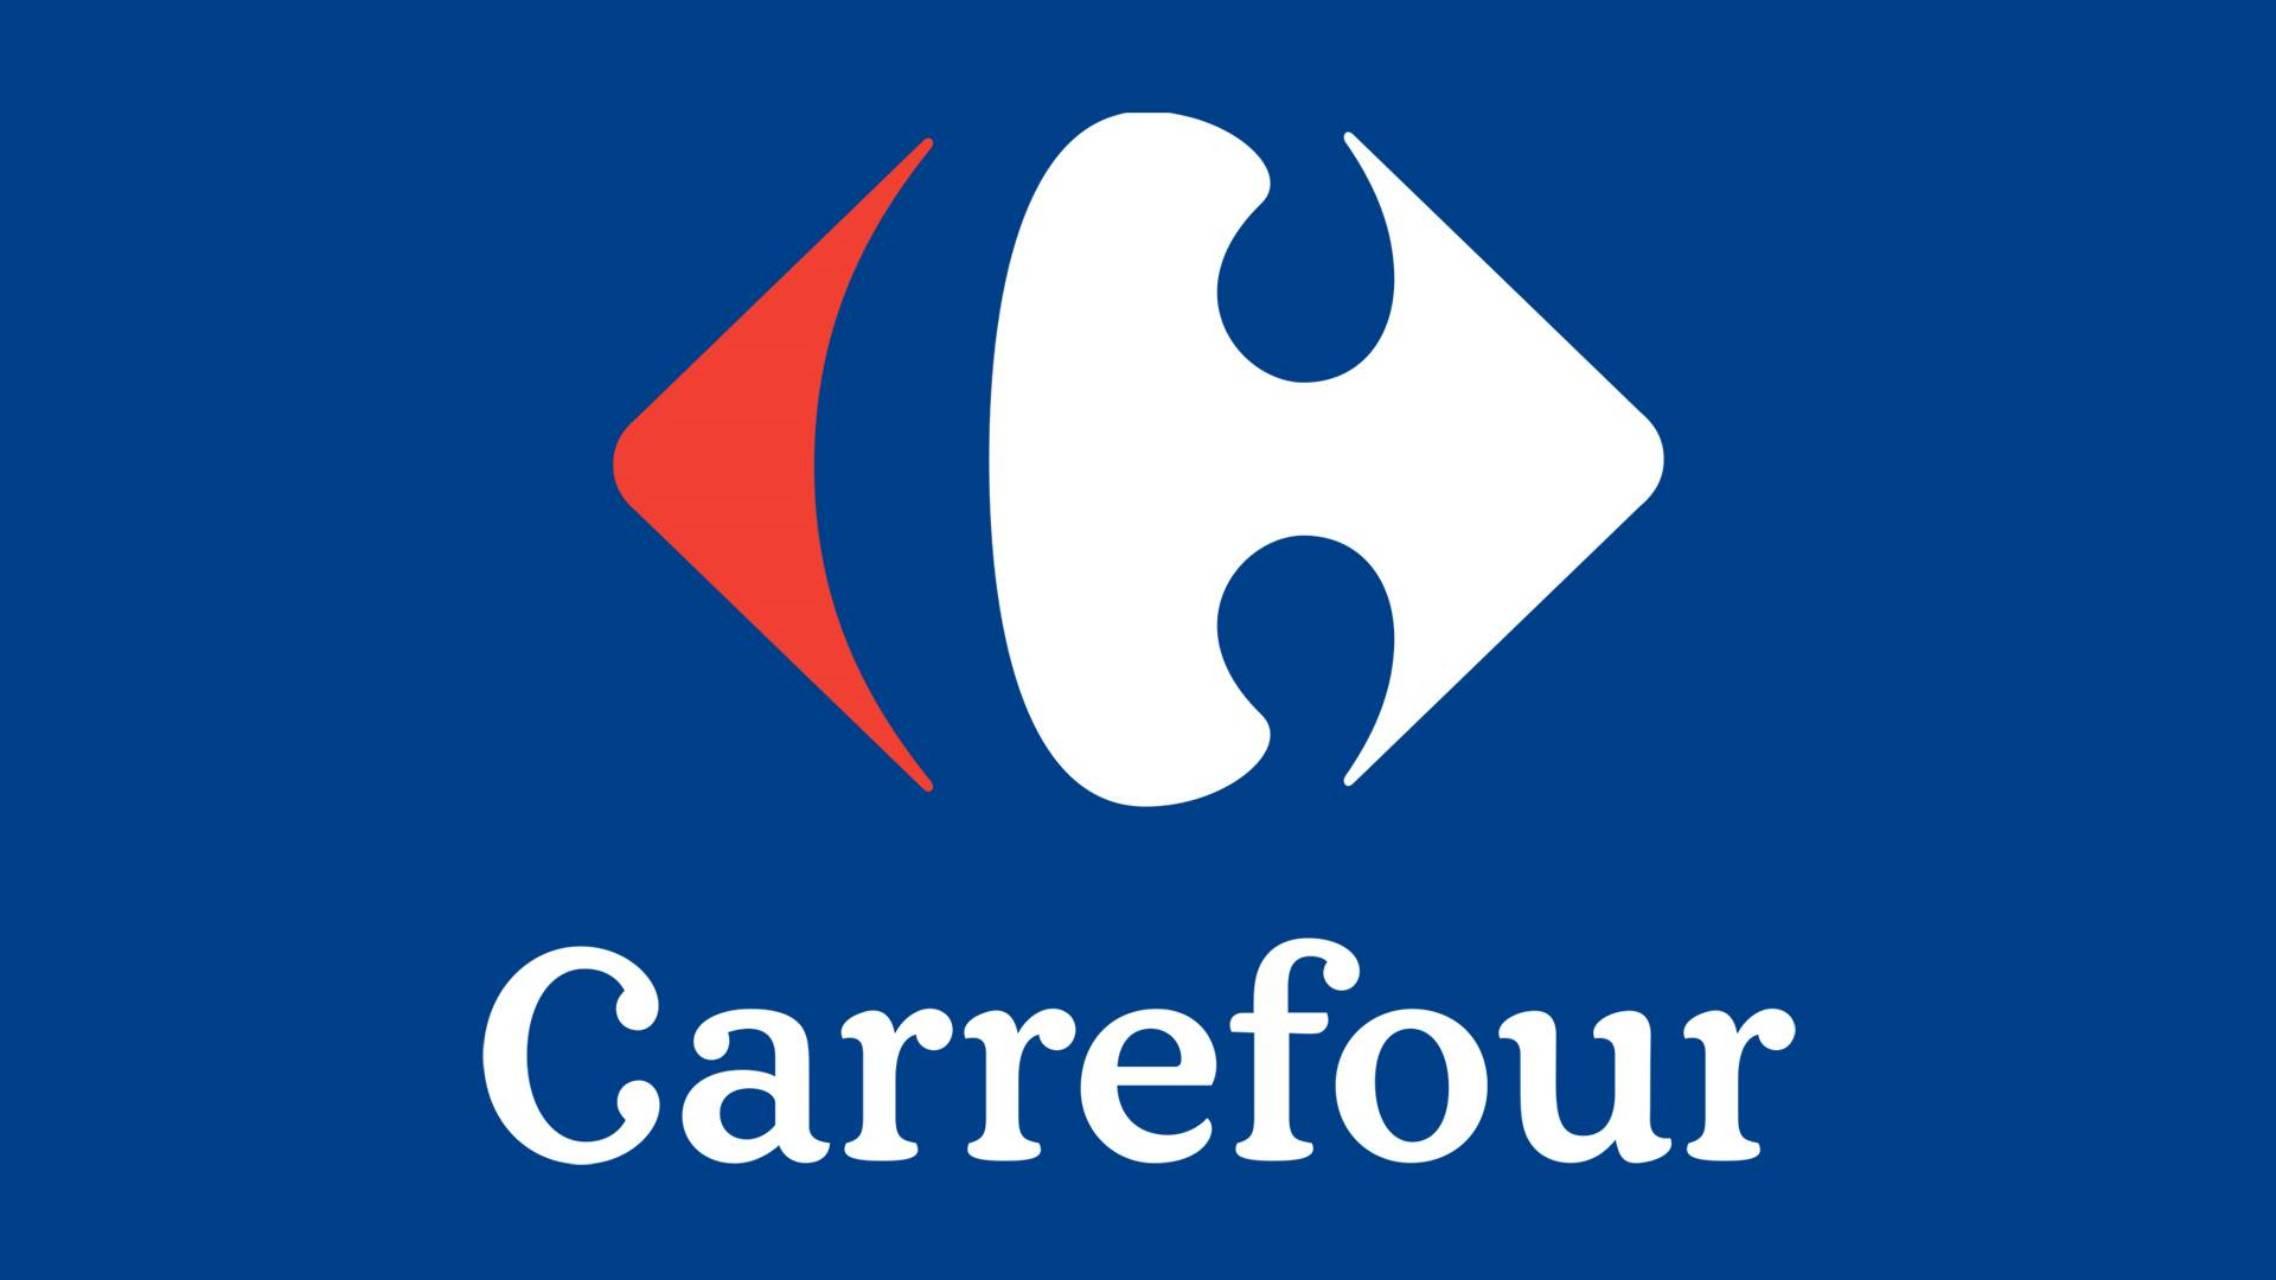 Carrefour ultima